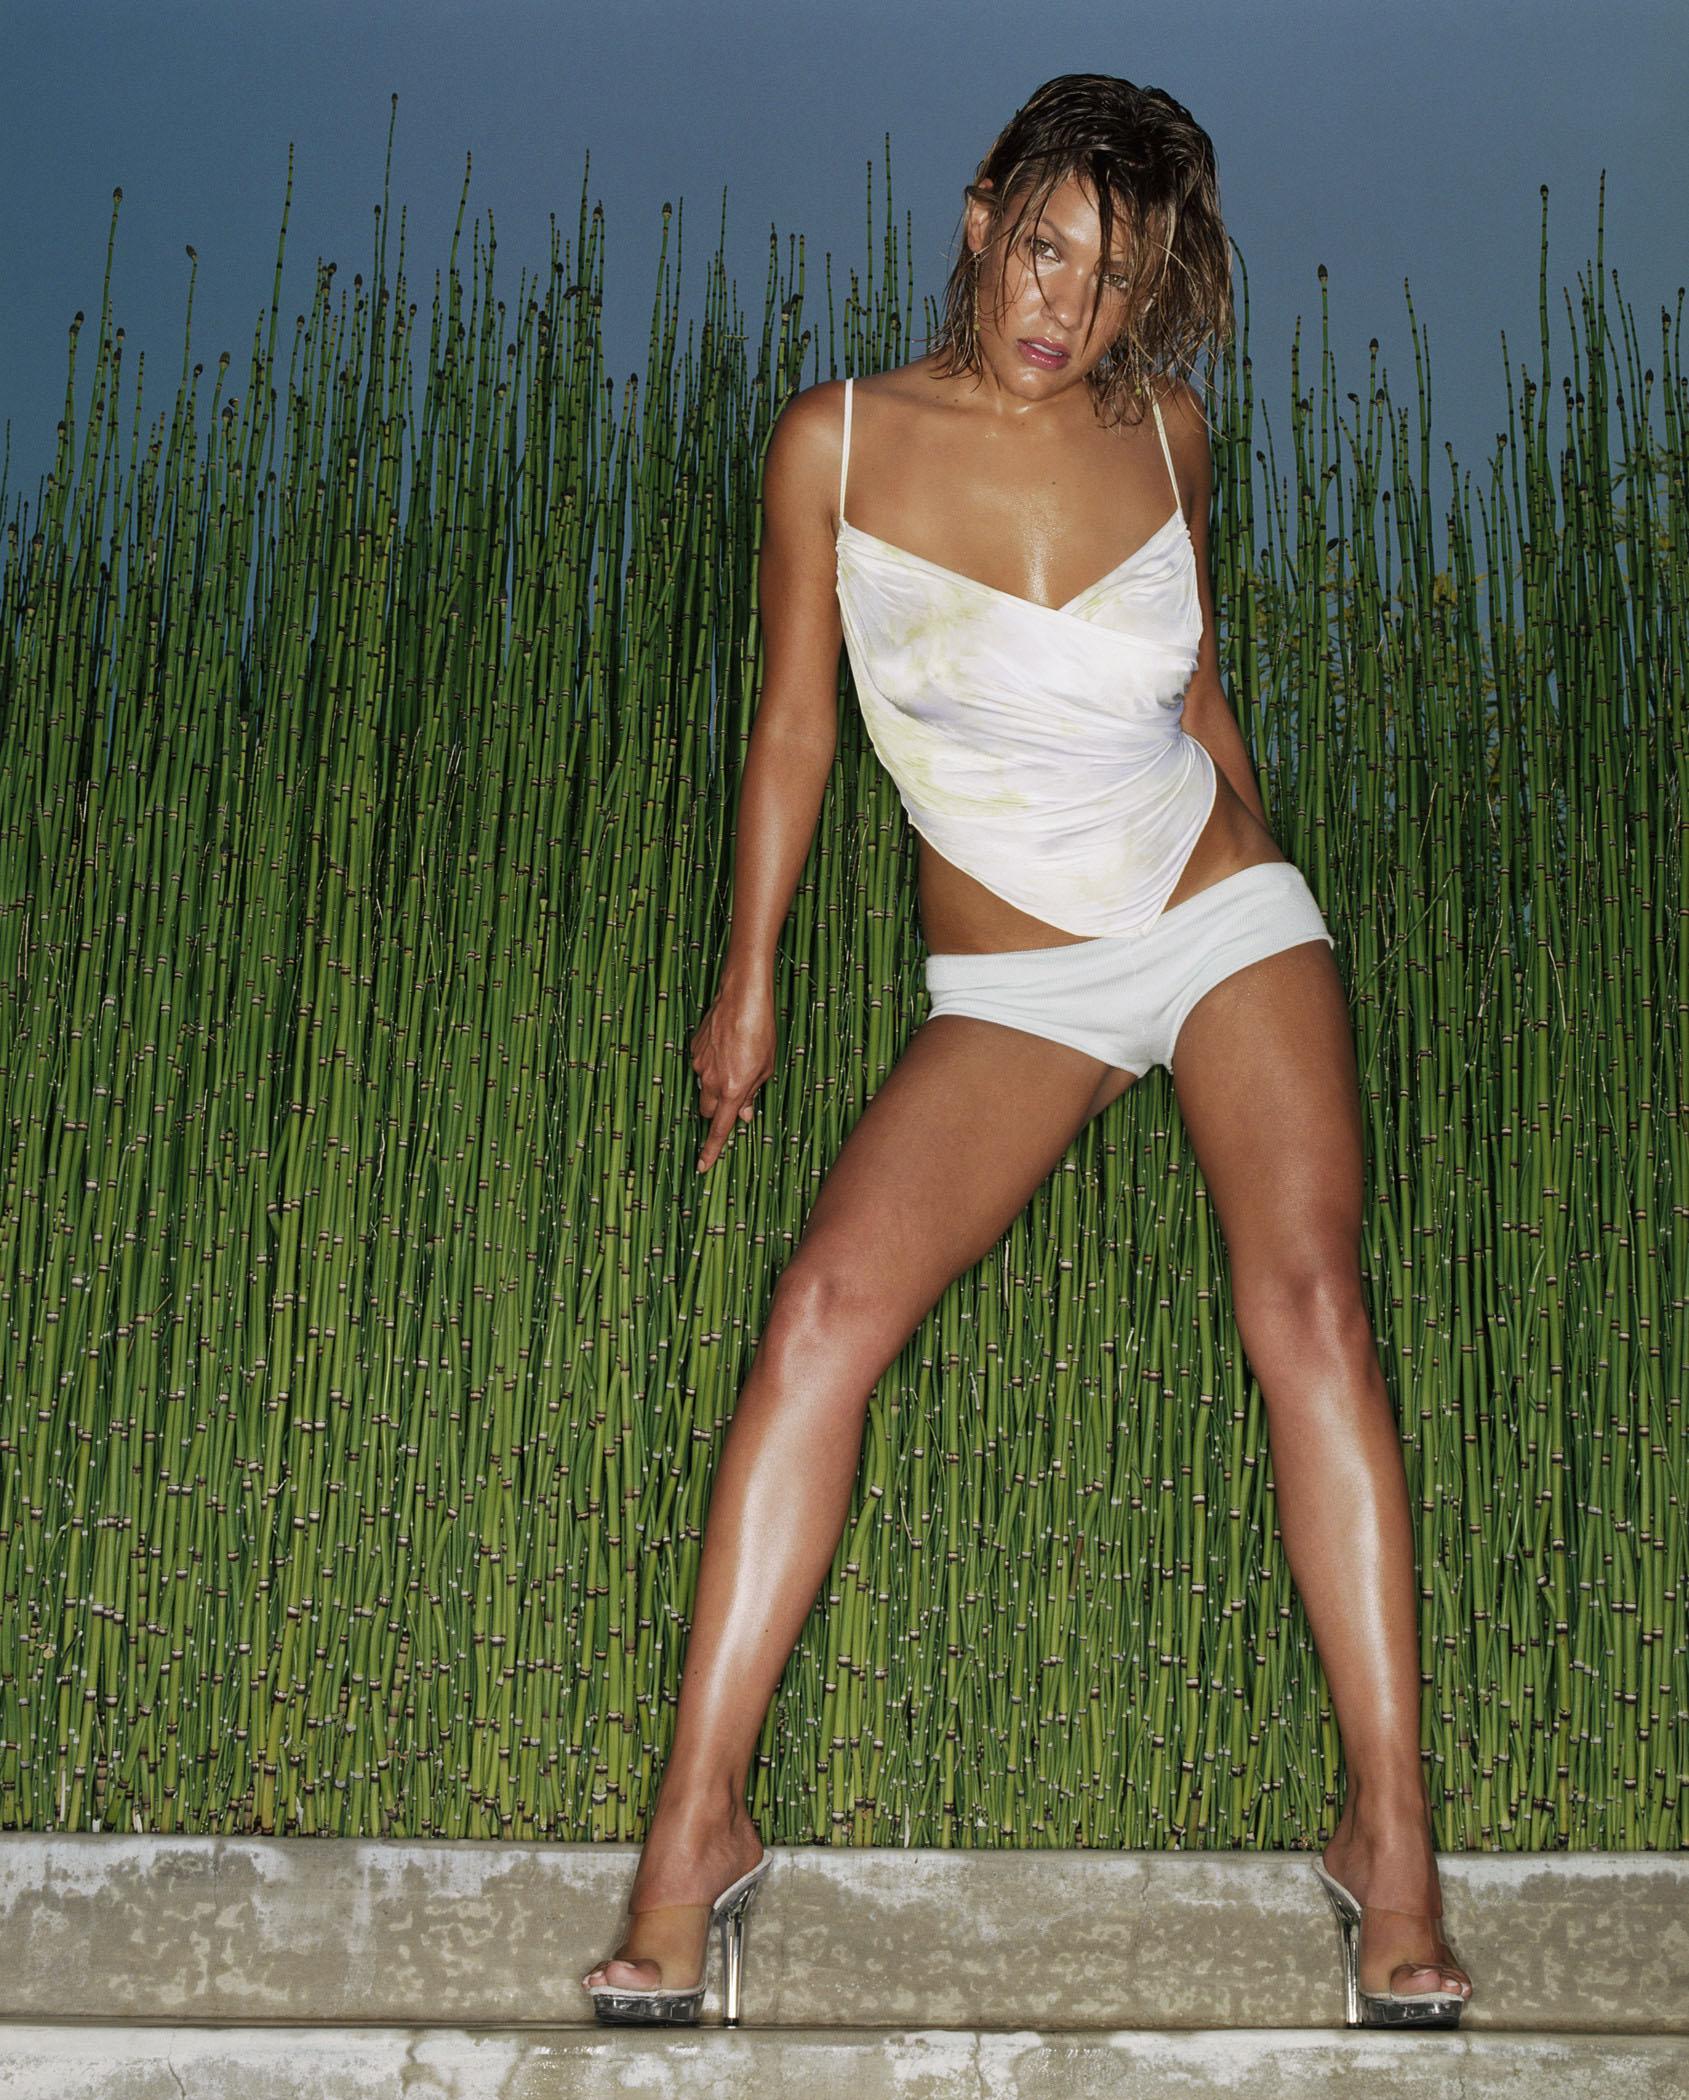 Bikini kiele sanchez